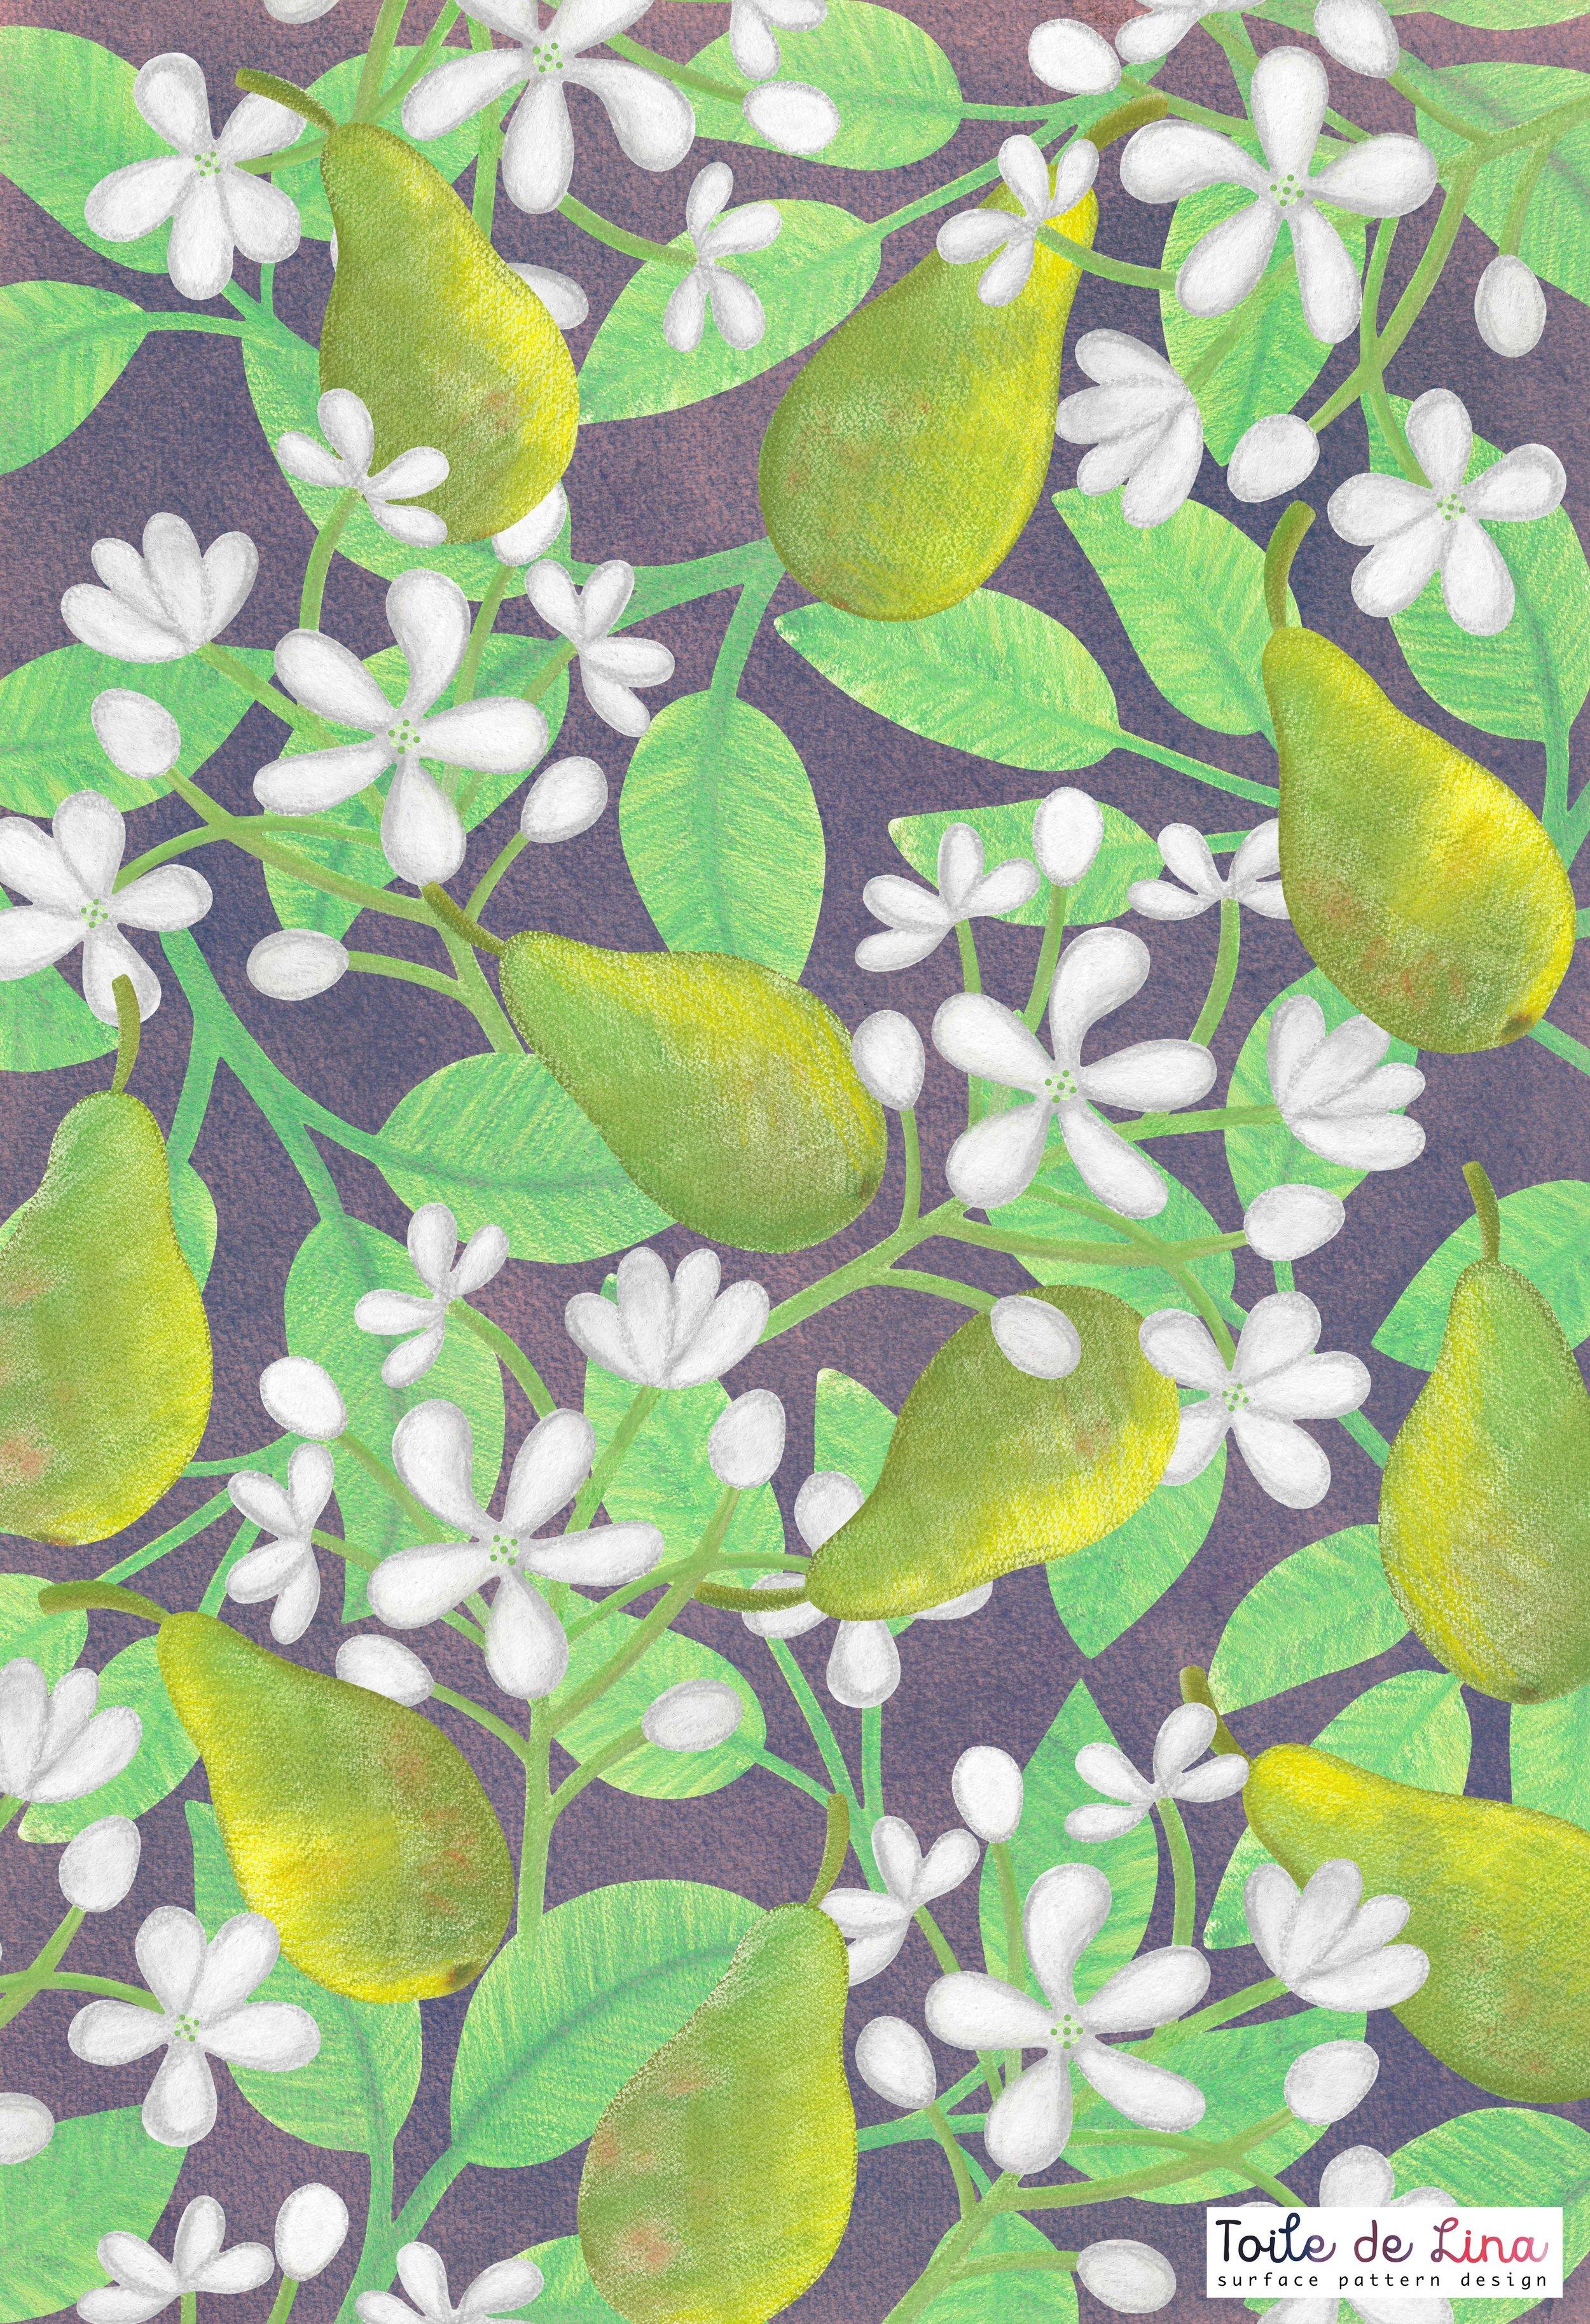 4 Lina Thuresson pear pattern.jpg